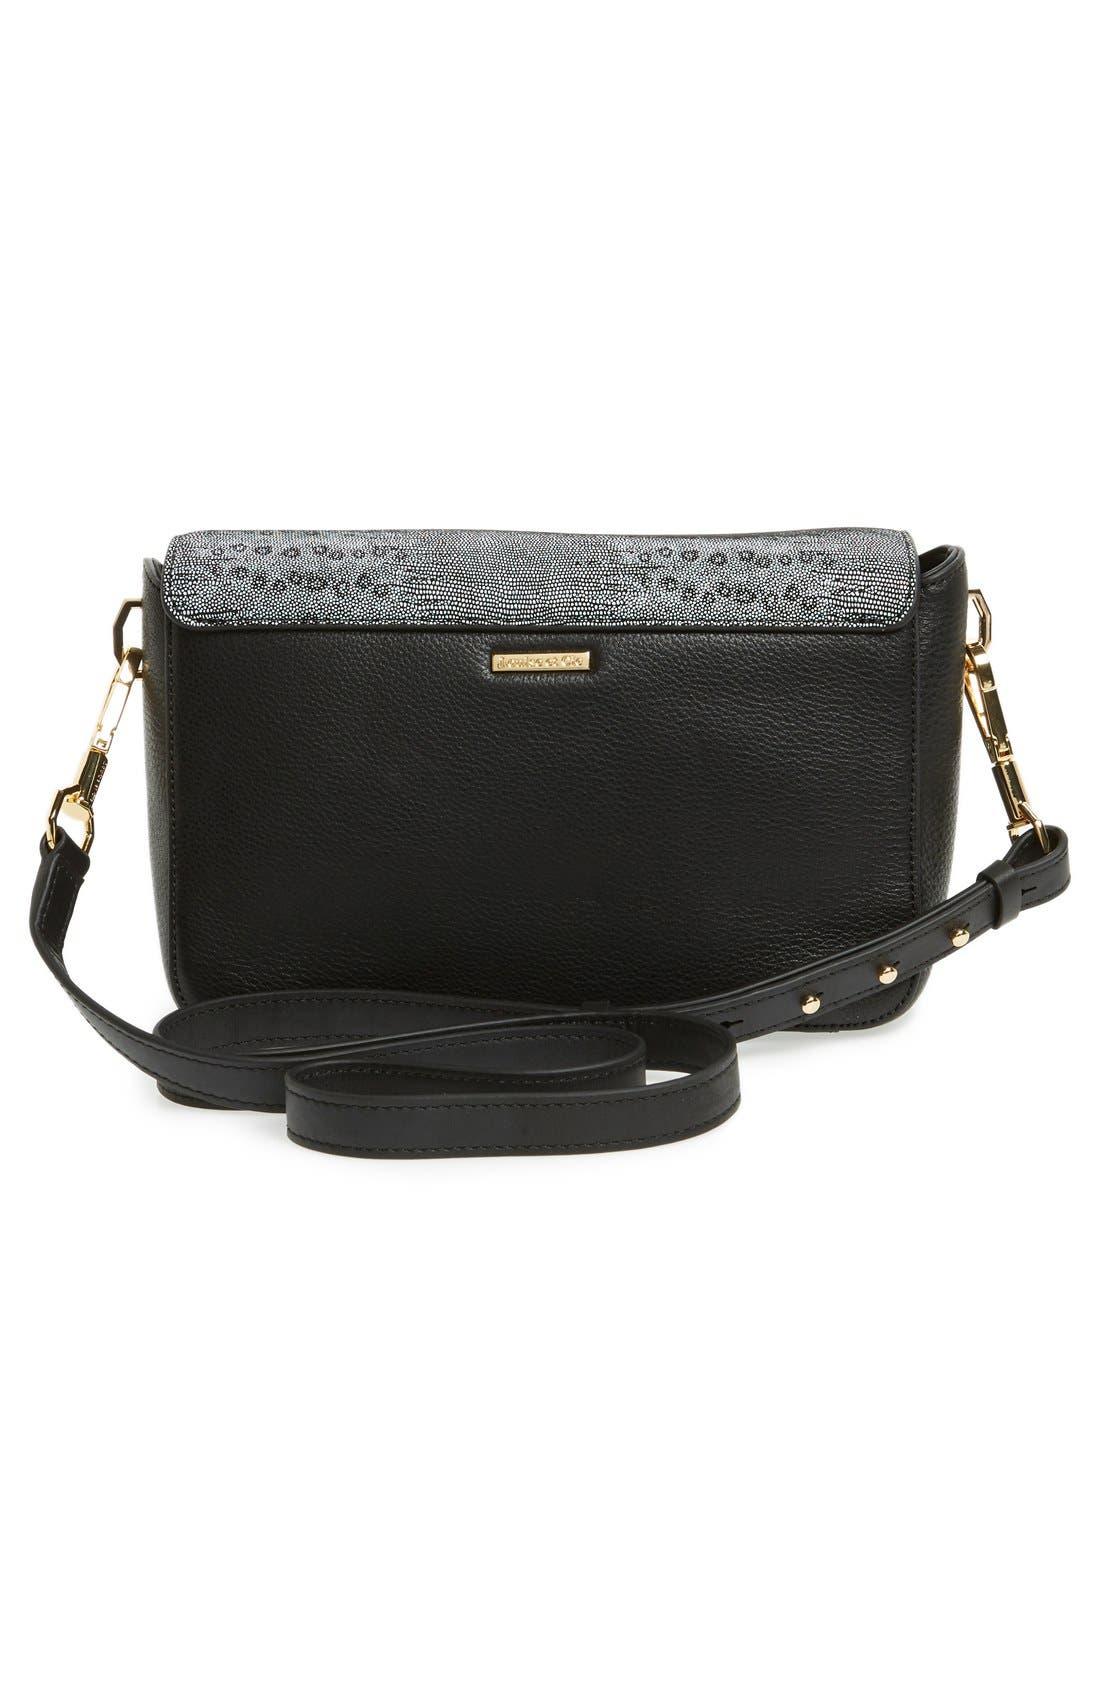 'Small Alis' Leather Crossbody Bag,                             Alternate thumbnail 3, color,                             001